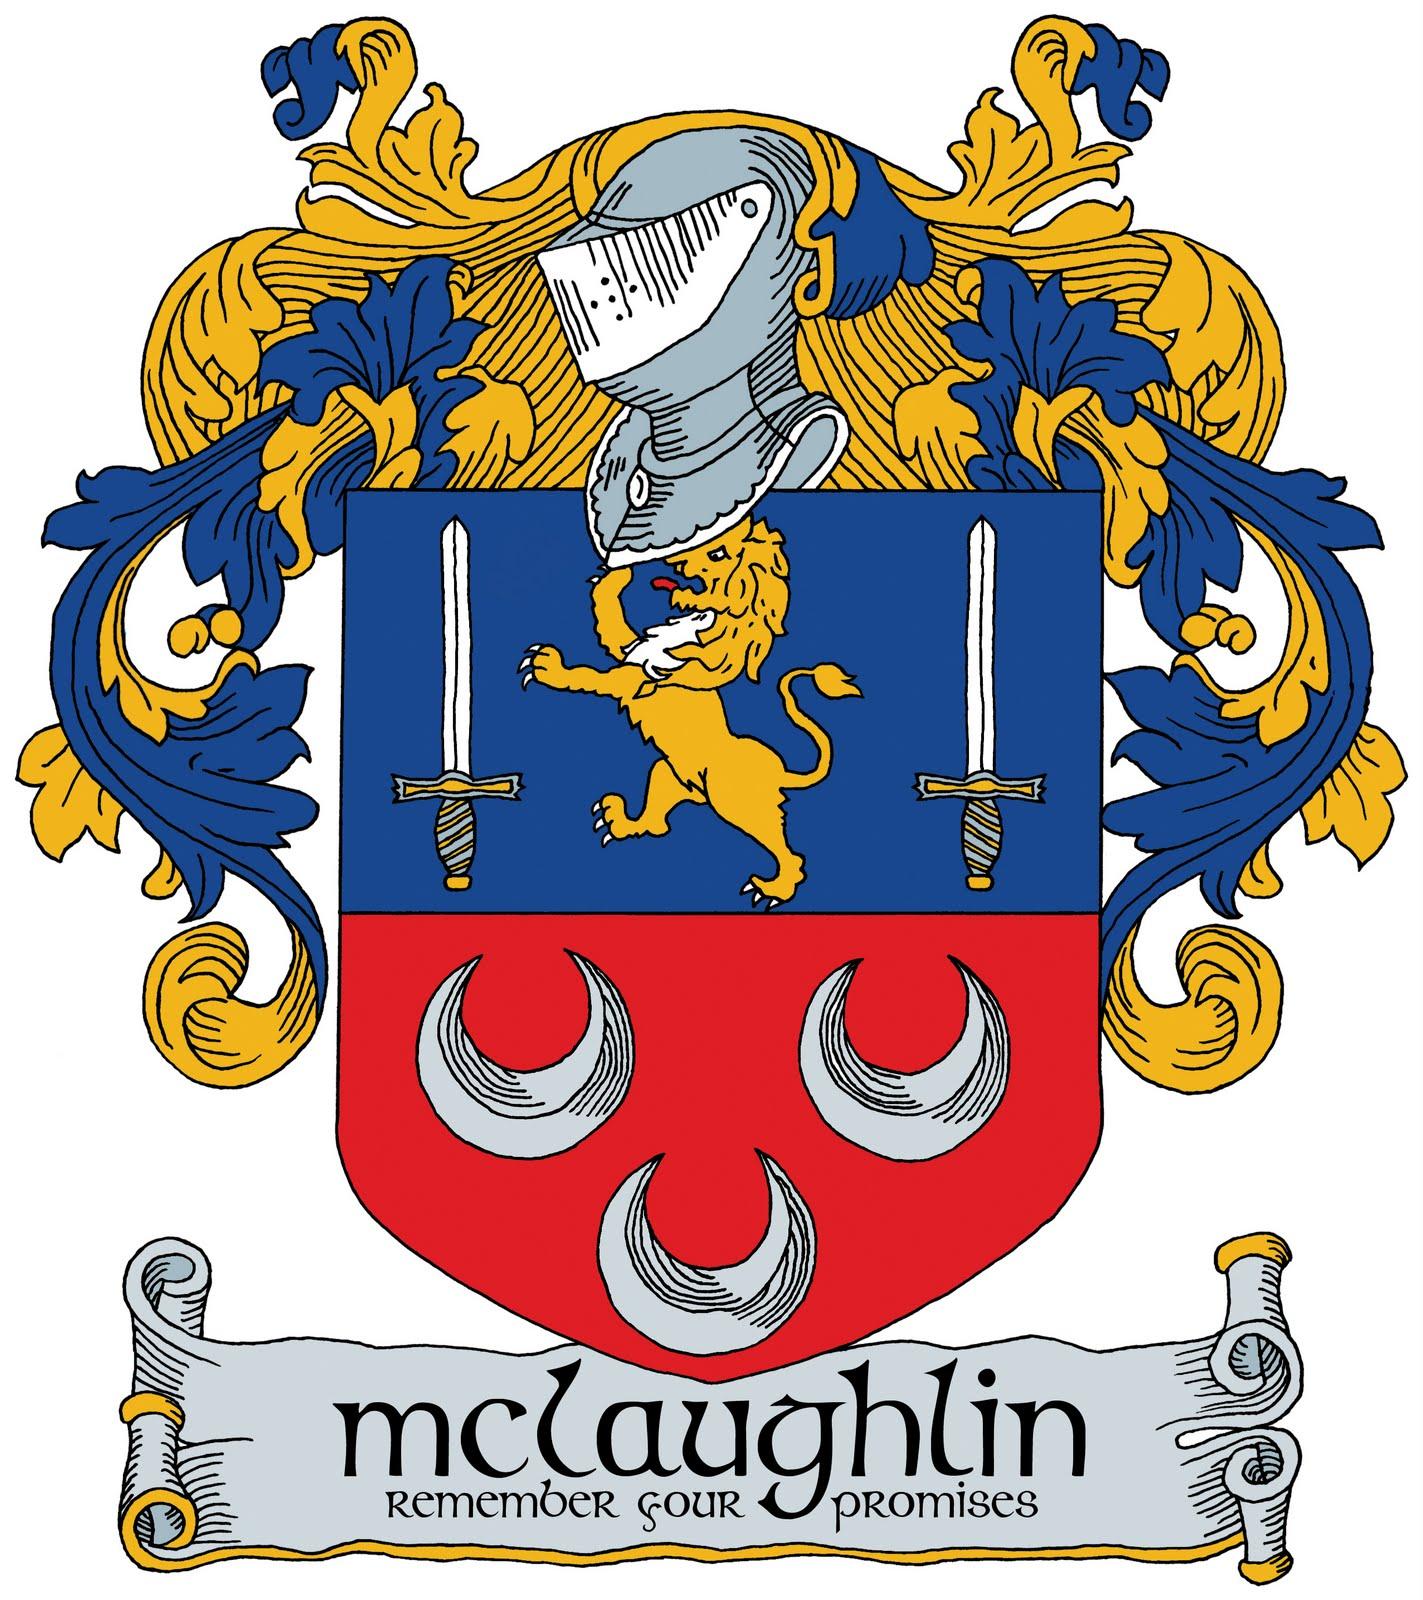 Robert mclaughlin the mclaughlin family coat of arms the mclaughlin family coat of arms buycottarizona Images